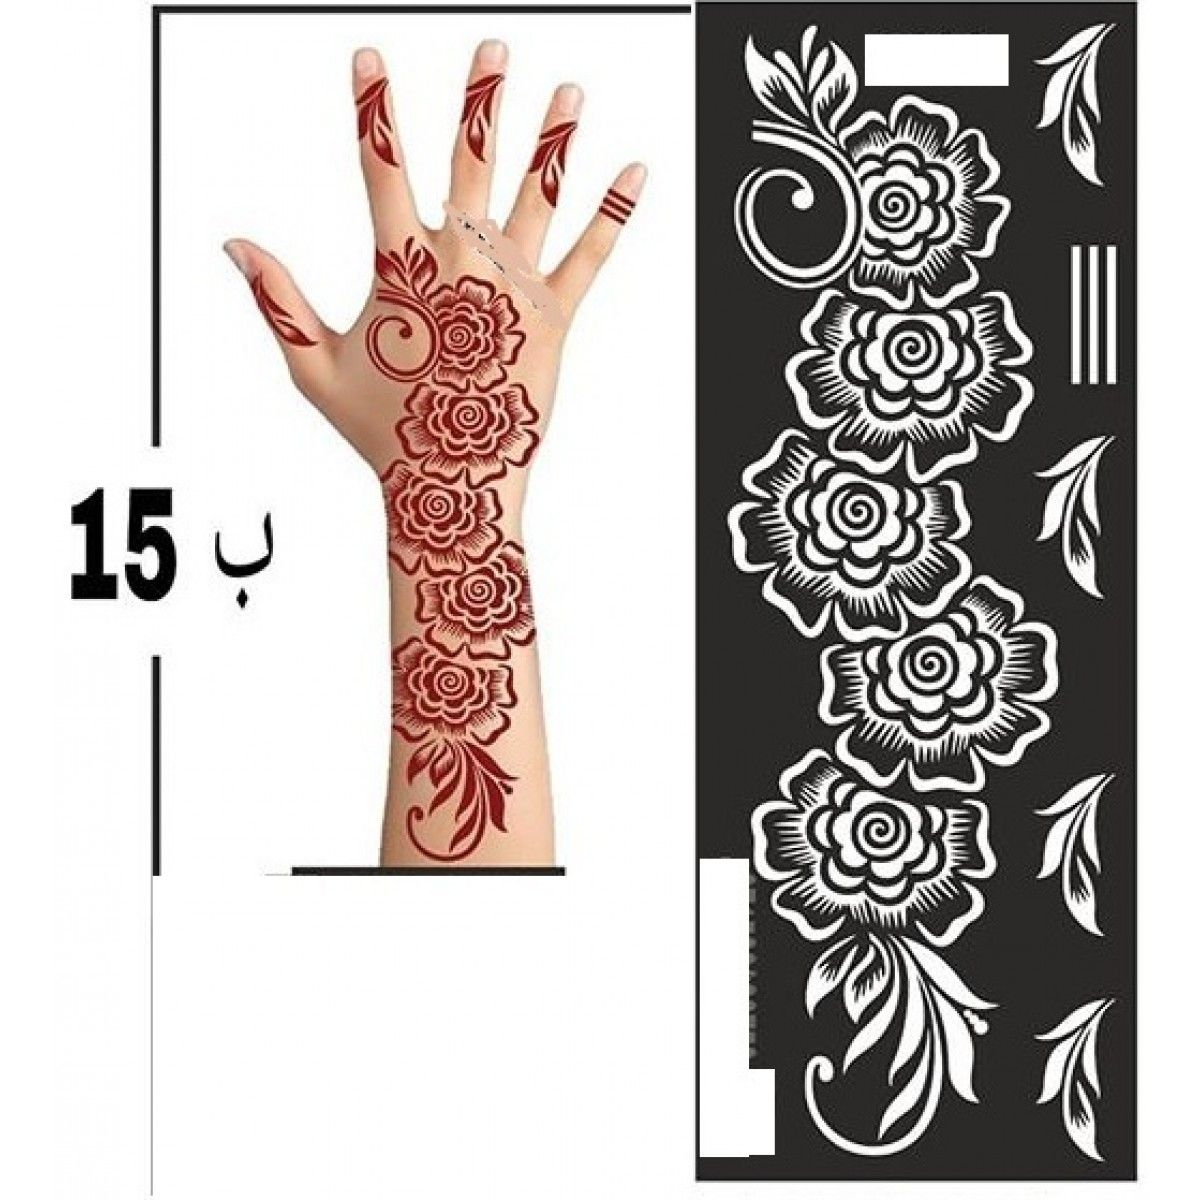 استيكر لليد نقش رقم 07 Hand Henna Book Silhouette Henna Hand Tattoo